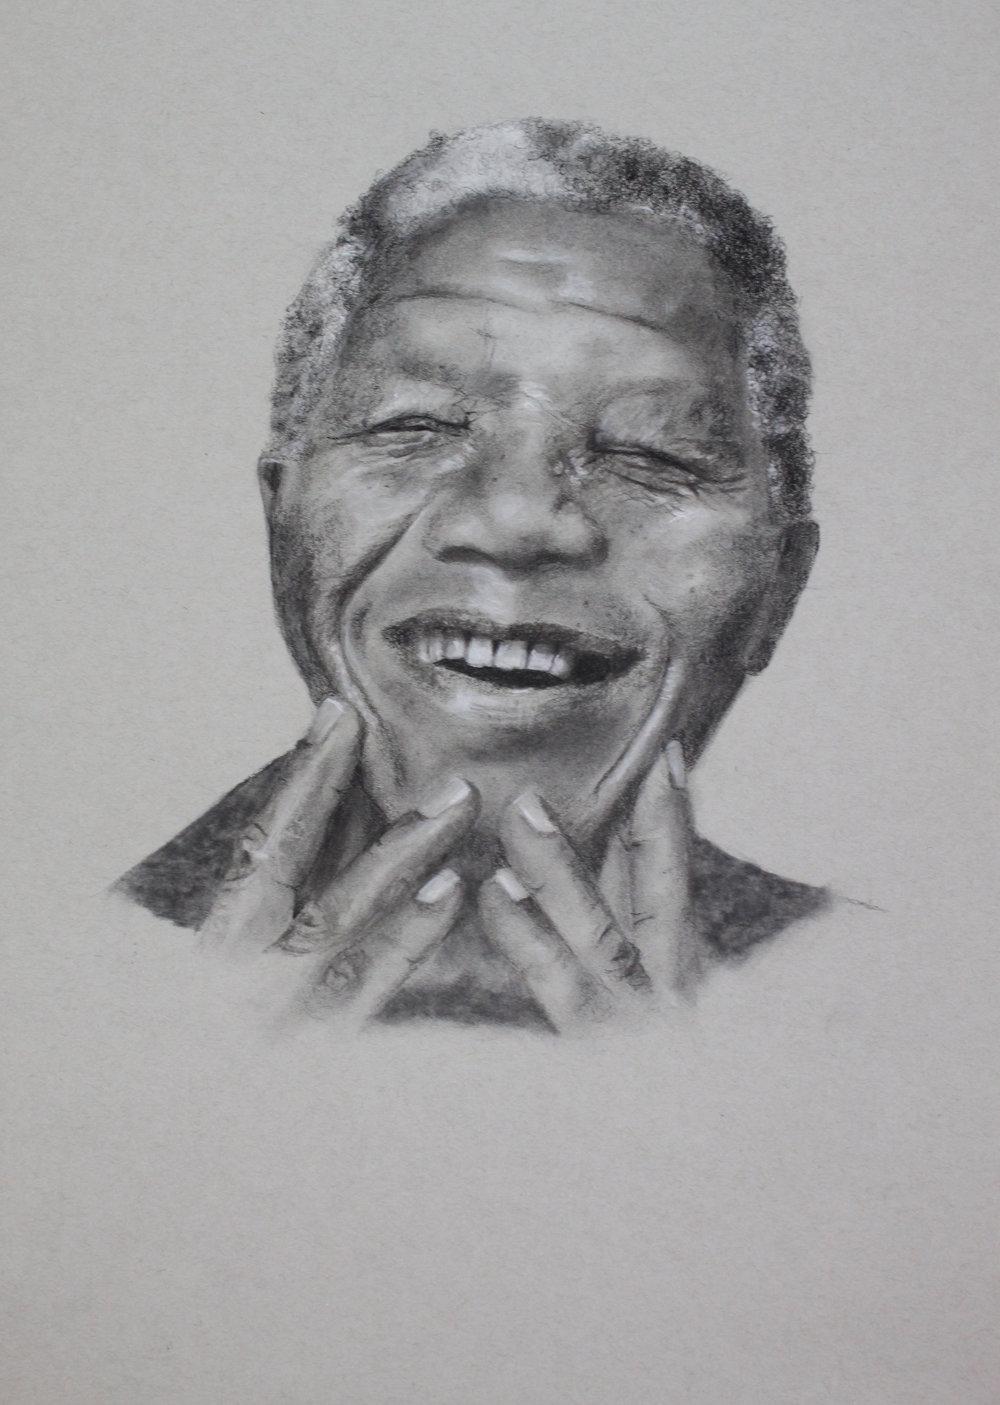 Mandela, charcoal on paper, 24 x 20